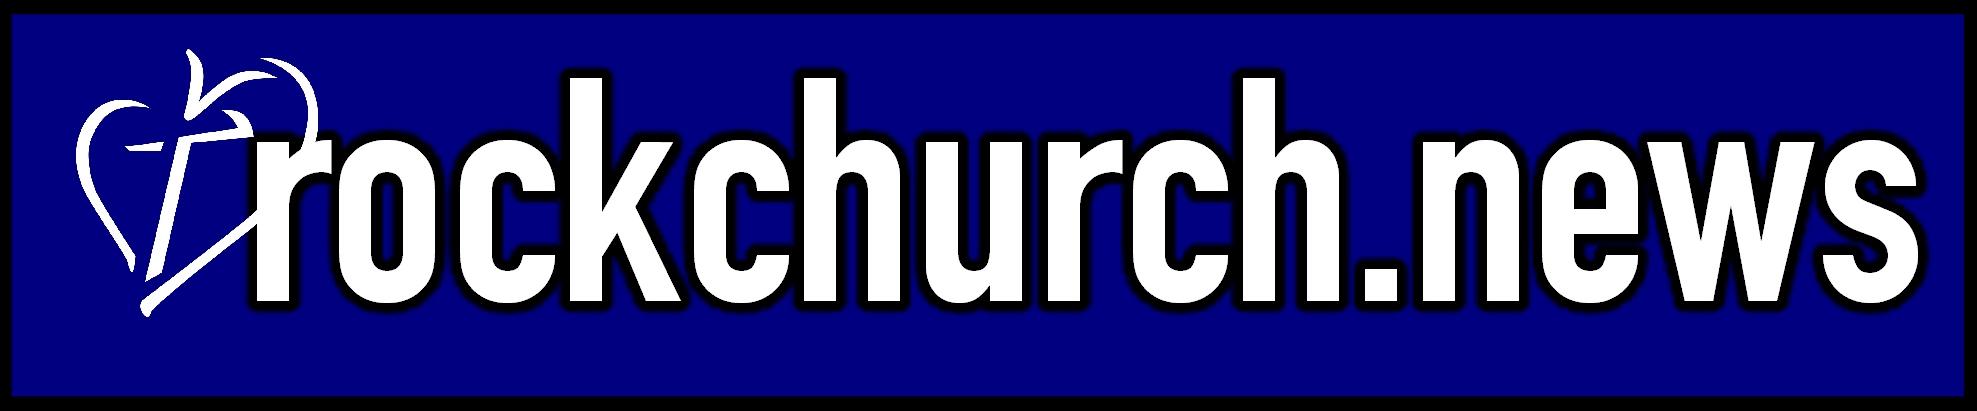 rockchurchnews header.jpg